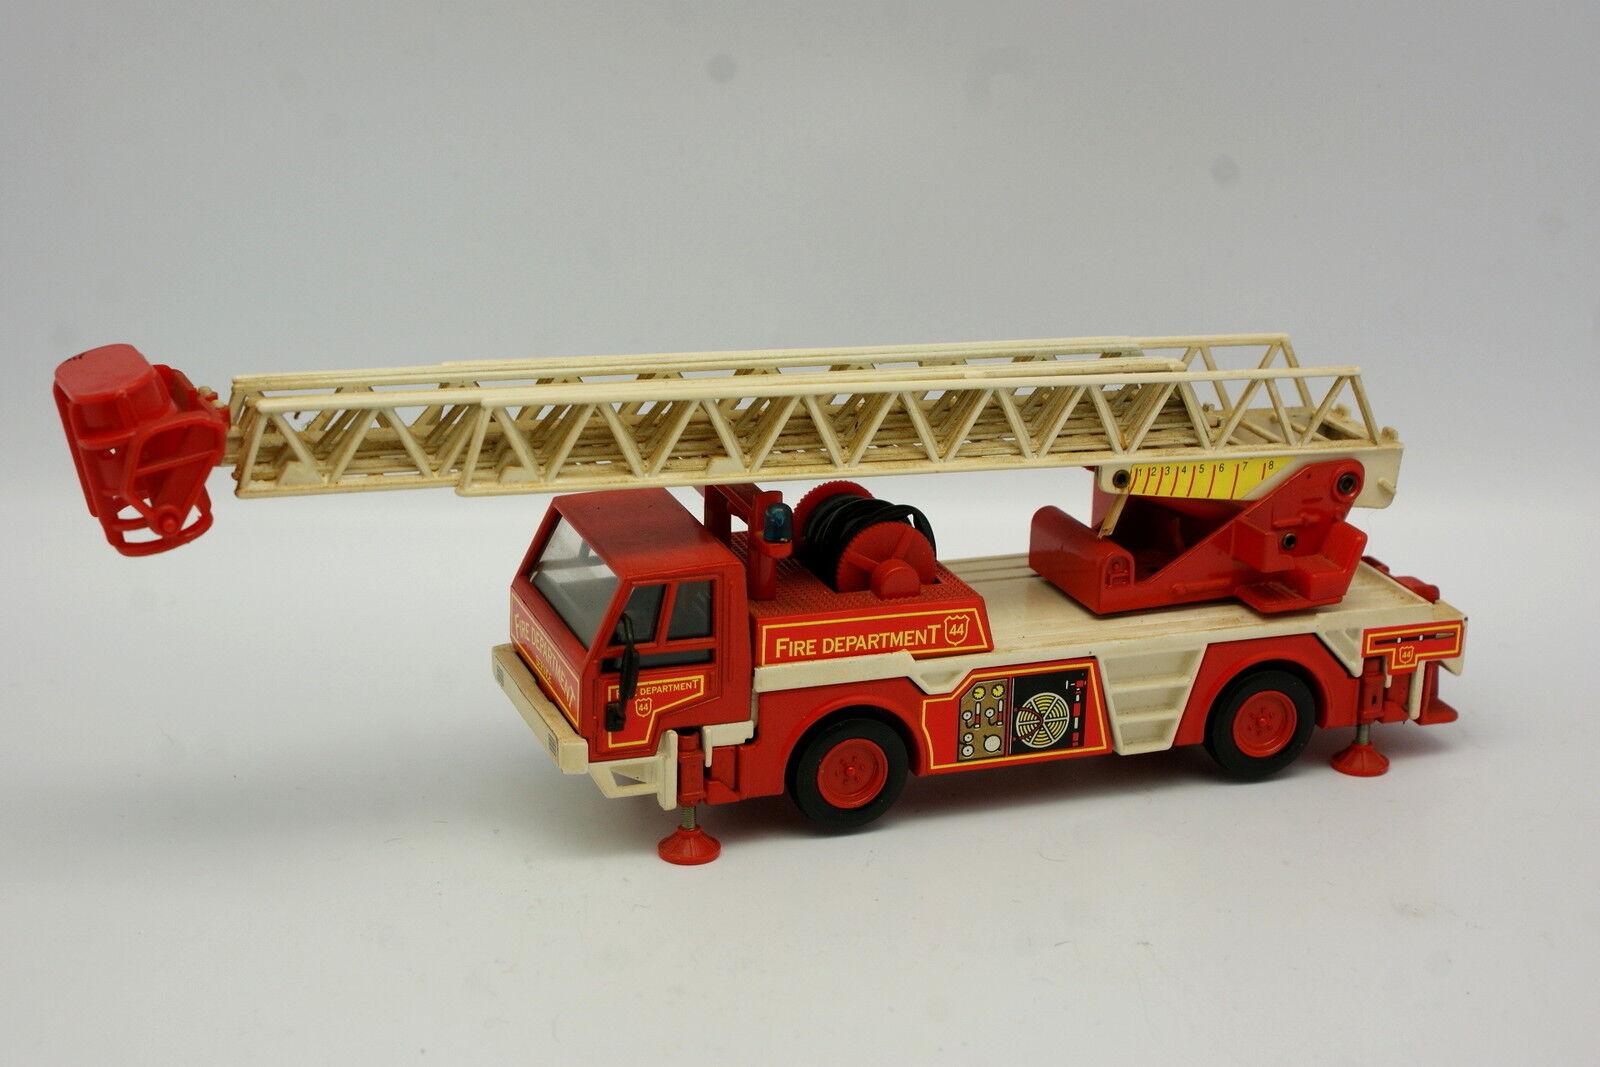 JOAL sb 1 50 - Camion di Pompieri Grande Scala